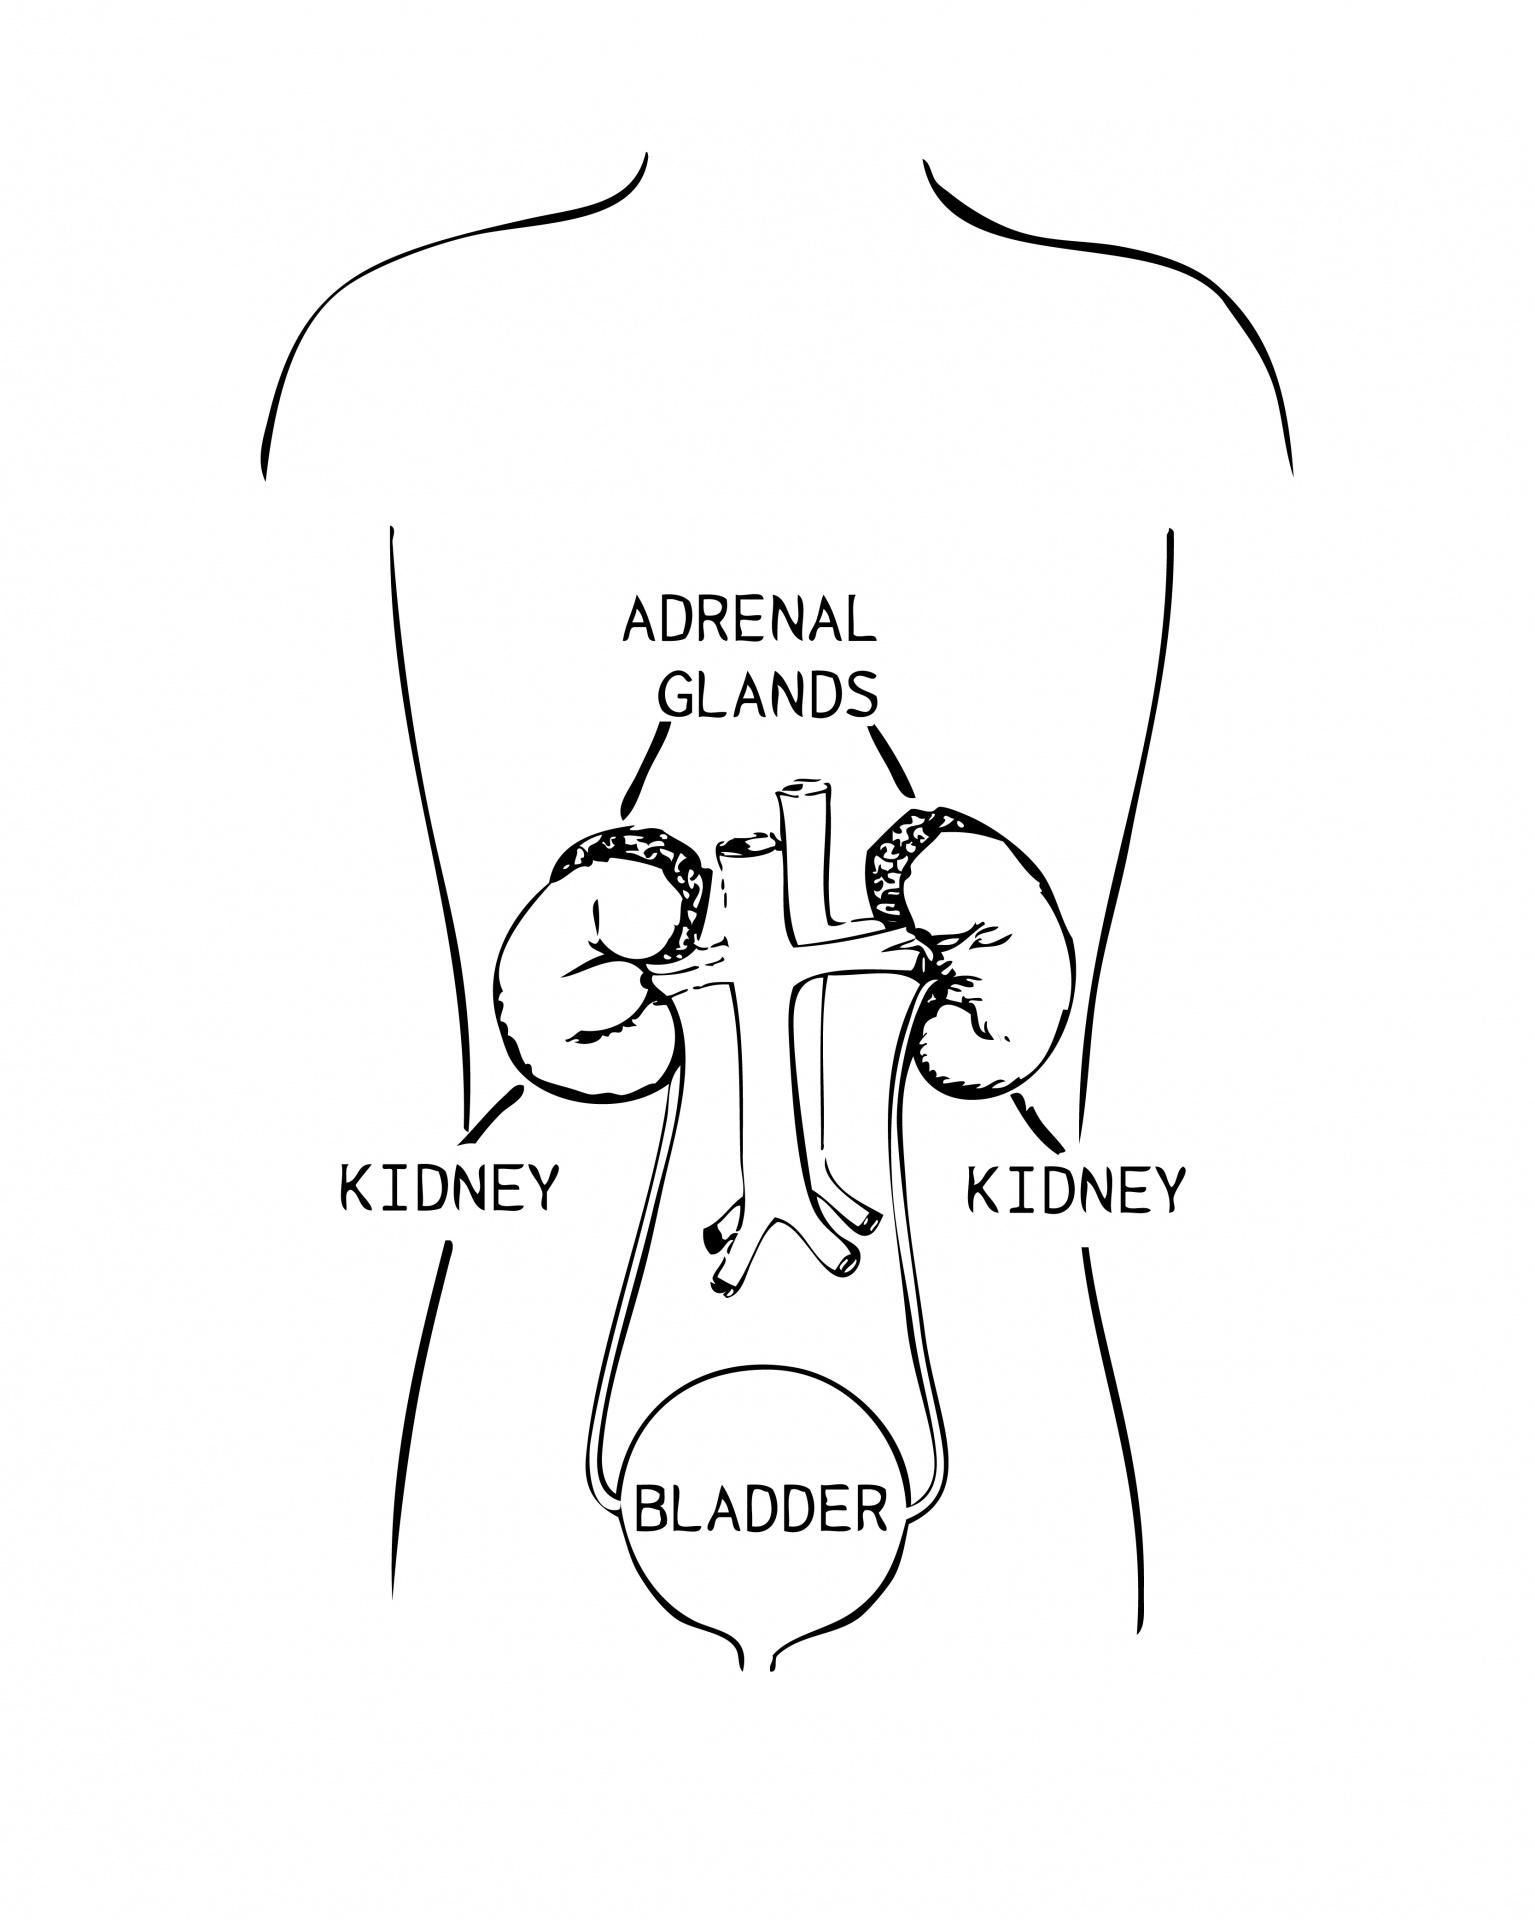 Adrenal Glands Diagram Illustration Free Stock Photo